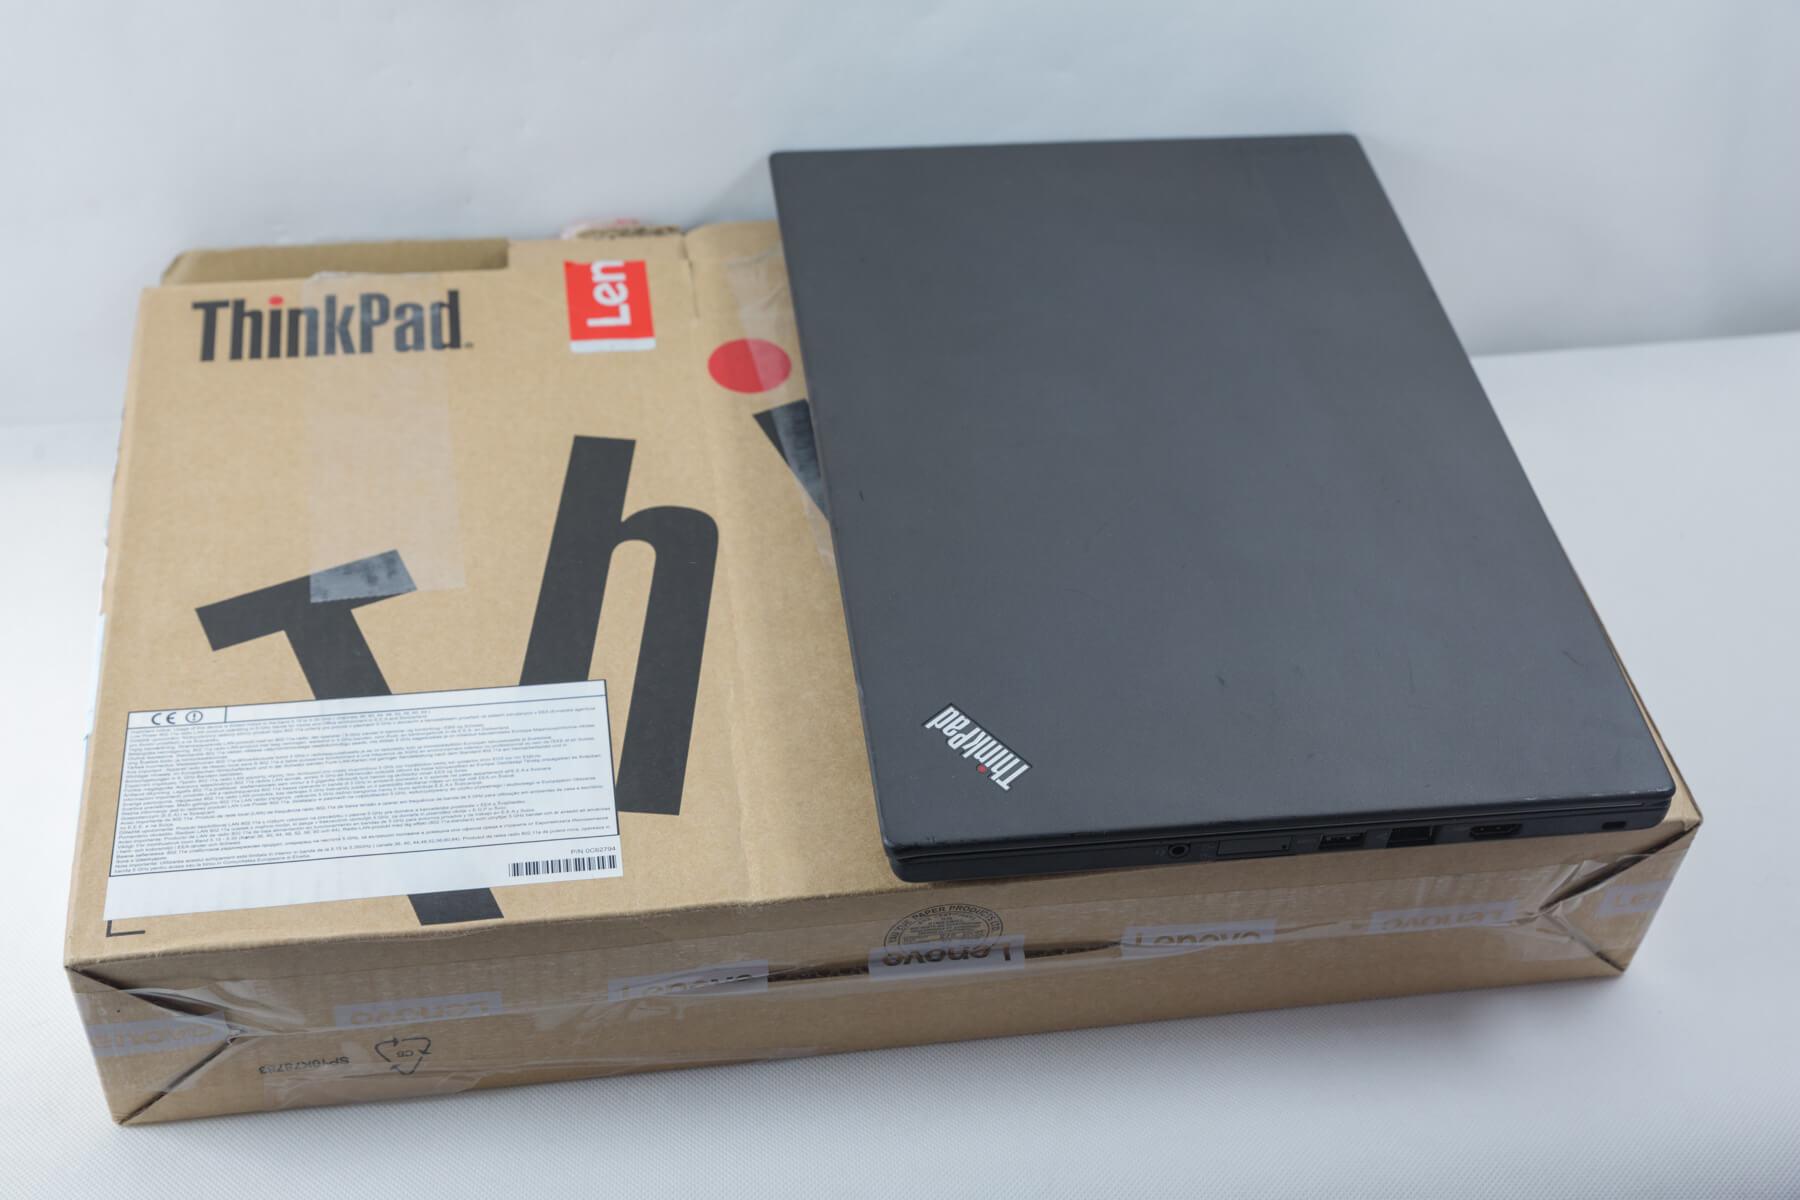 Kup tanio komputer - ThinkPad